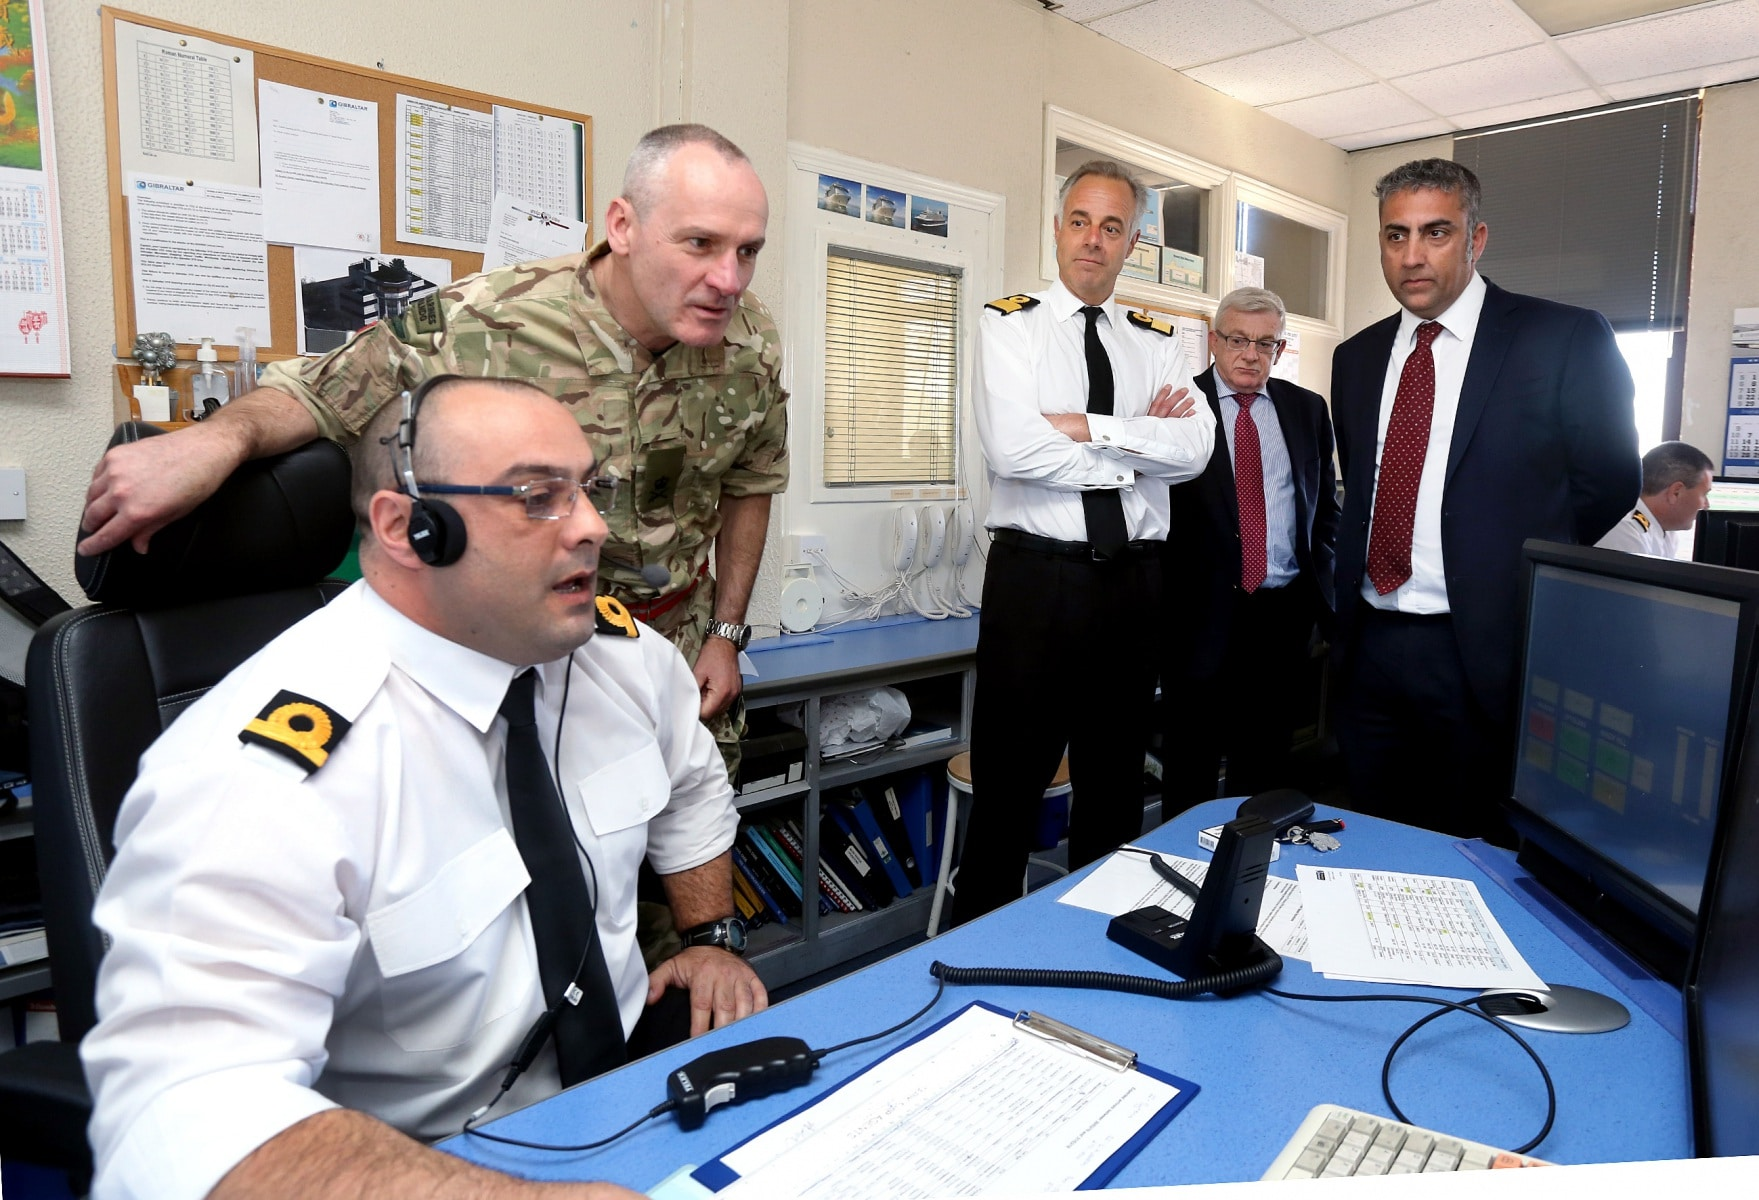 visita-oficial-del-gobernador-al-puerto-de-gibraltar_25551863003_o